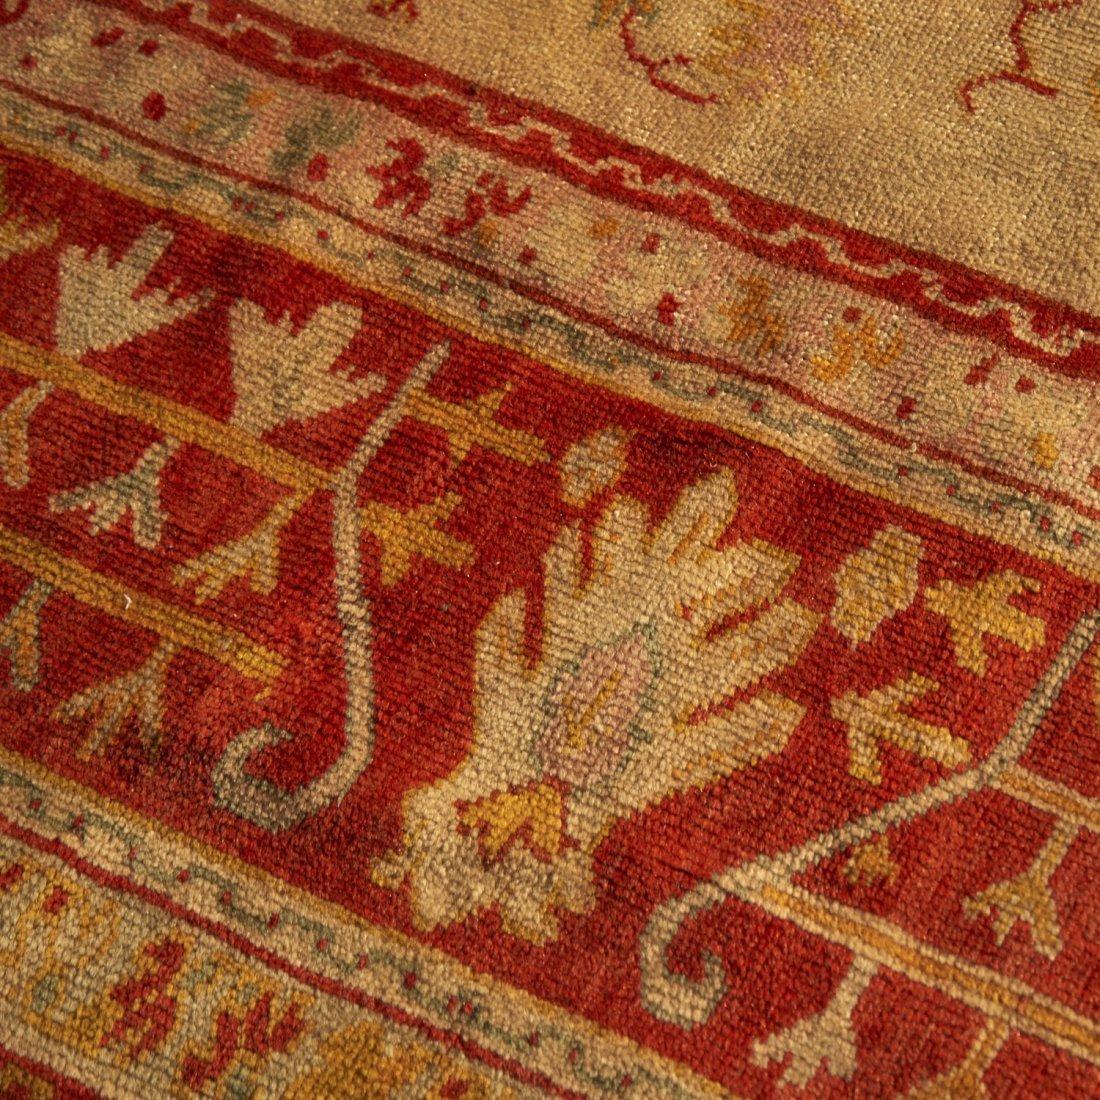 Room-size Oushak carpet - 6